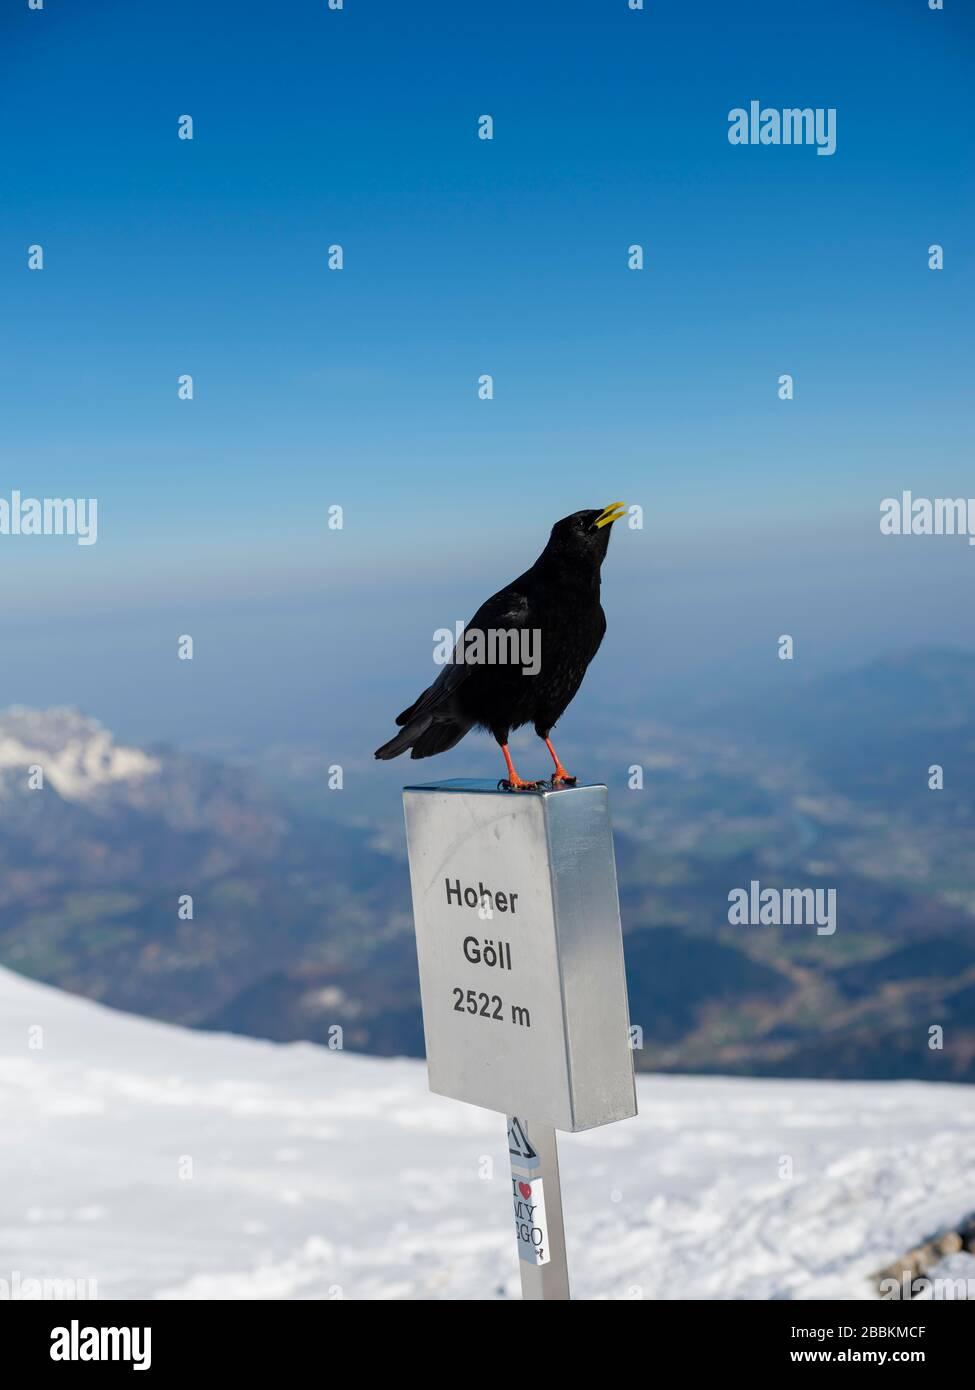 Alpine Chough (Pyrrhocorax graculus) on the summit mark of the Hohe Goell, in winter, Berchtesgaden Alps, Berchtesgaden National Park Stock Photo